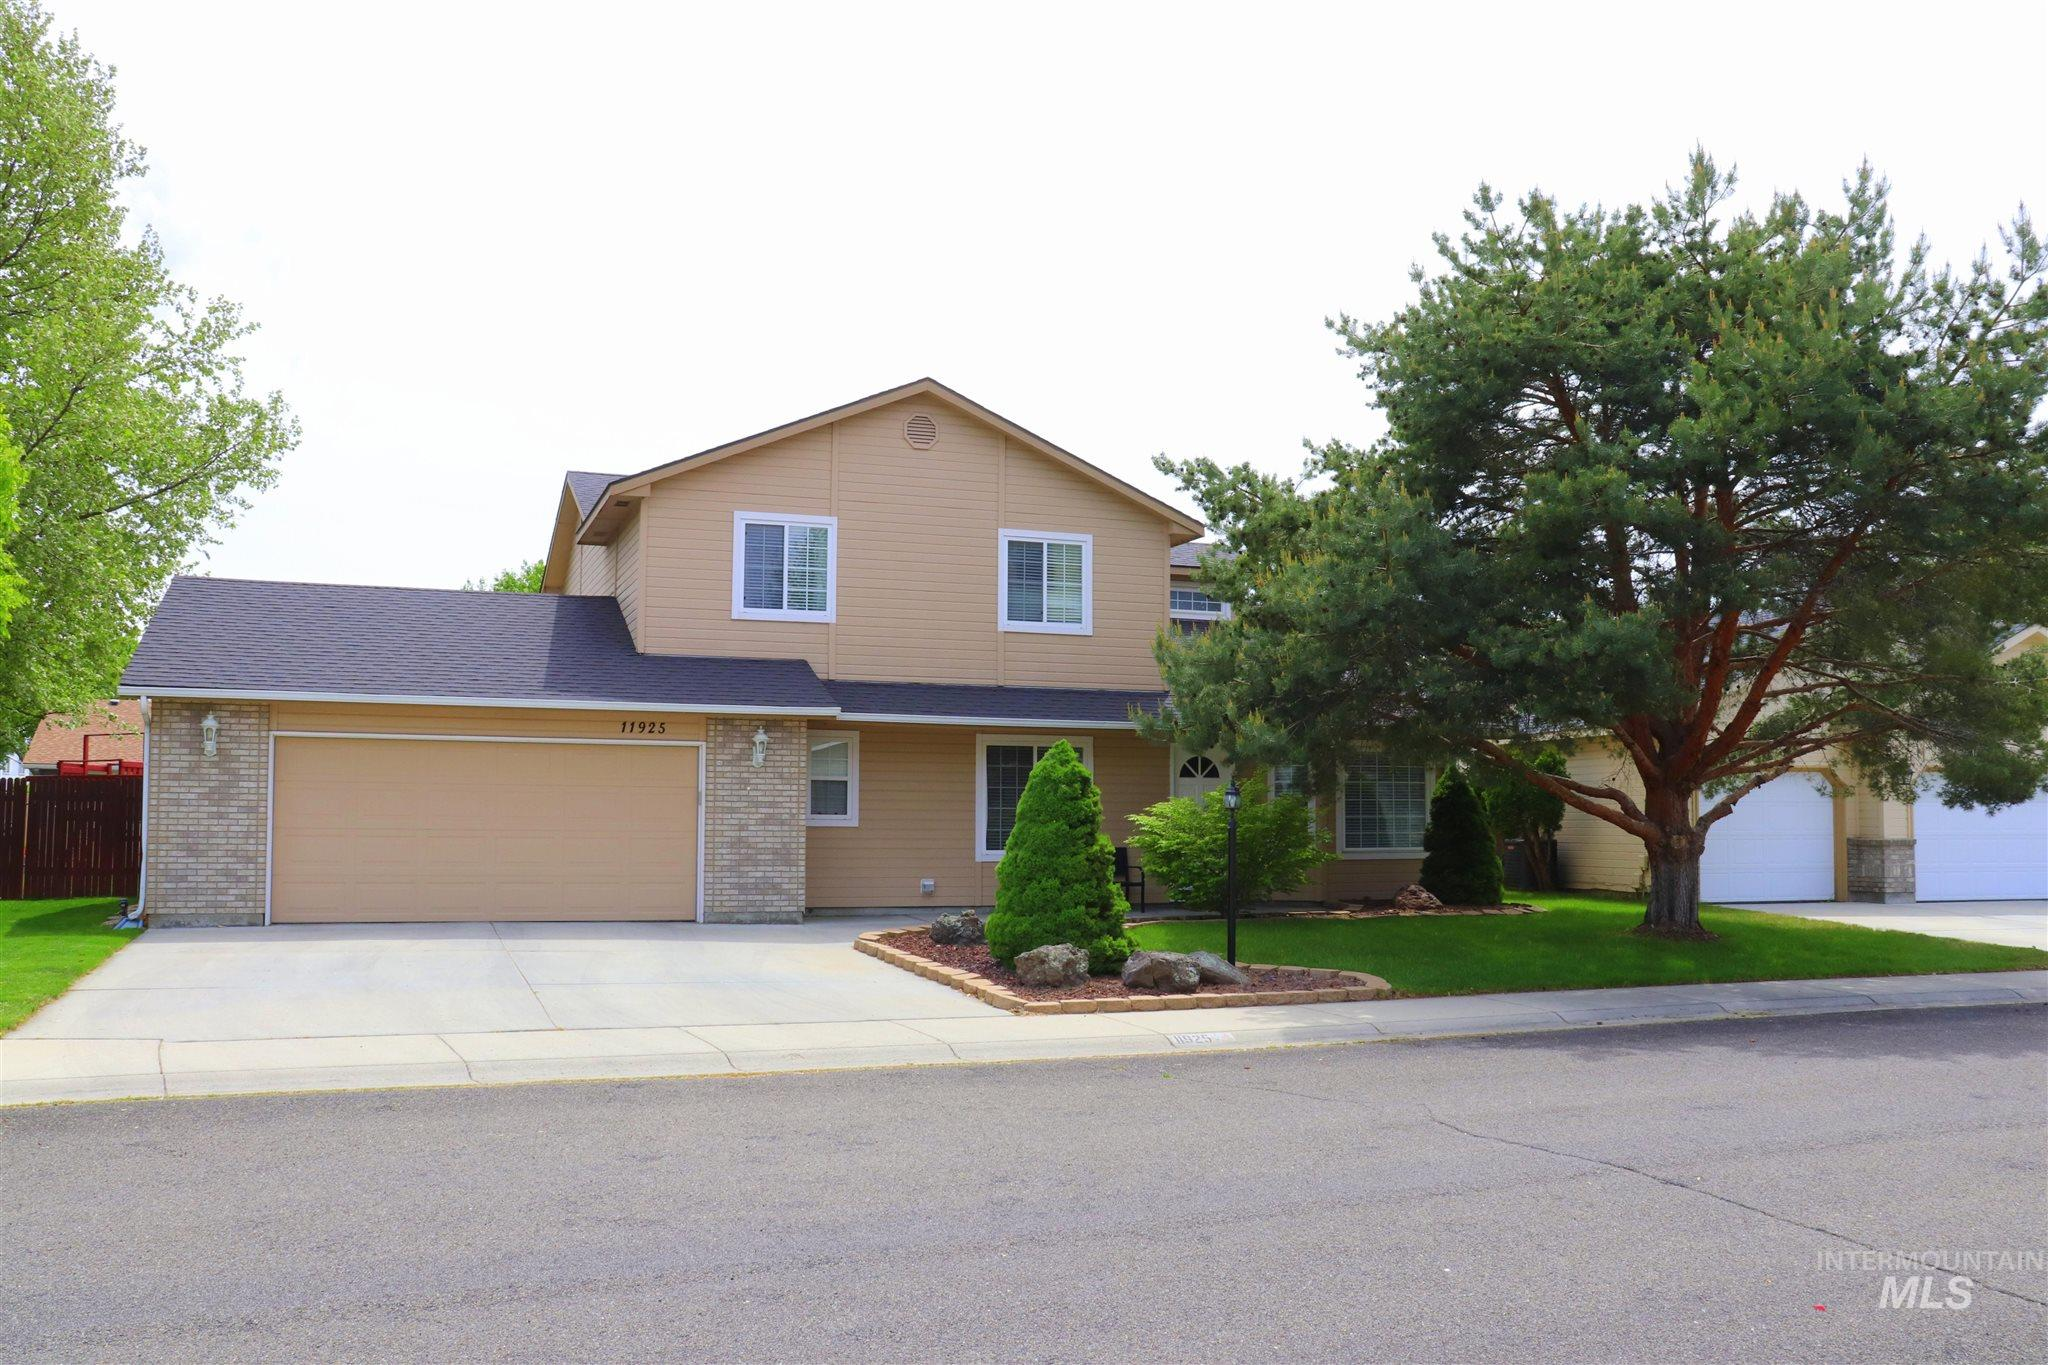 11925 W Emerson Property Photo - Boise, ID real estate listing